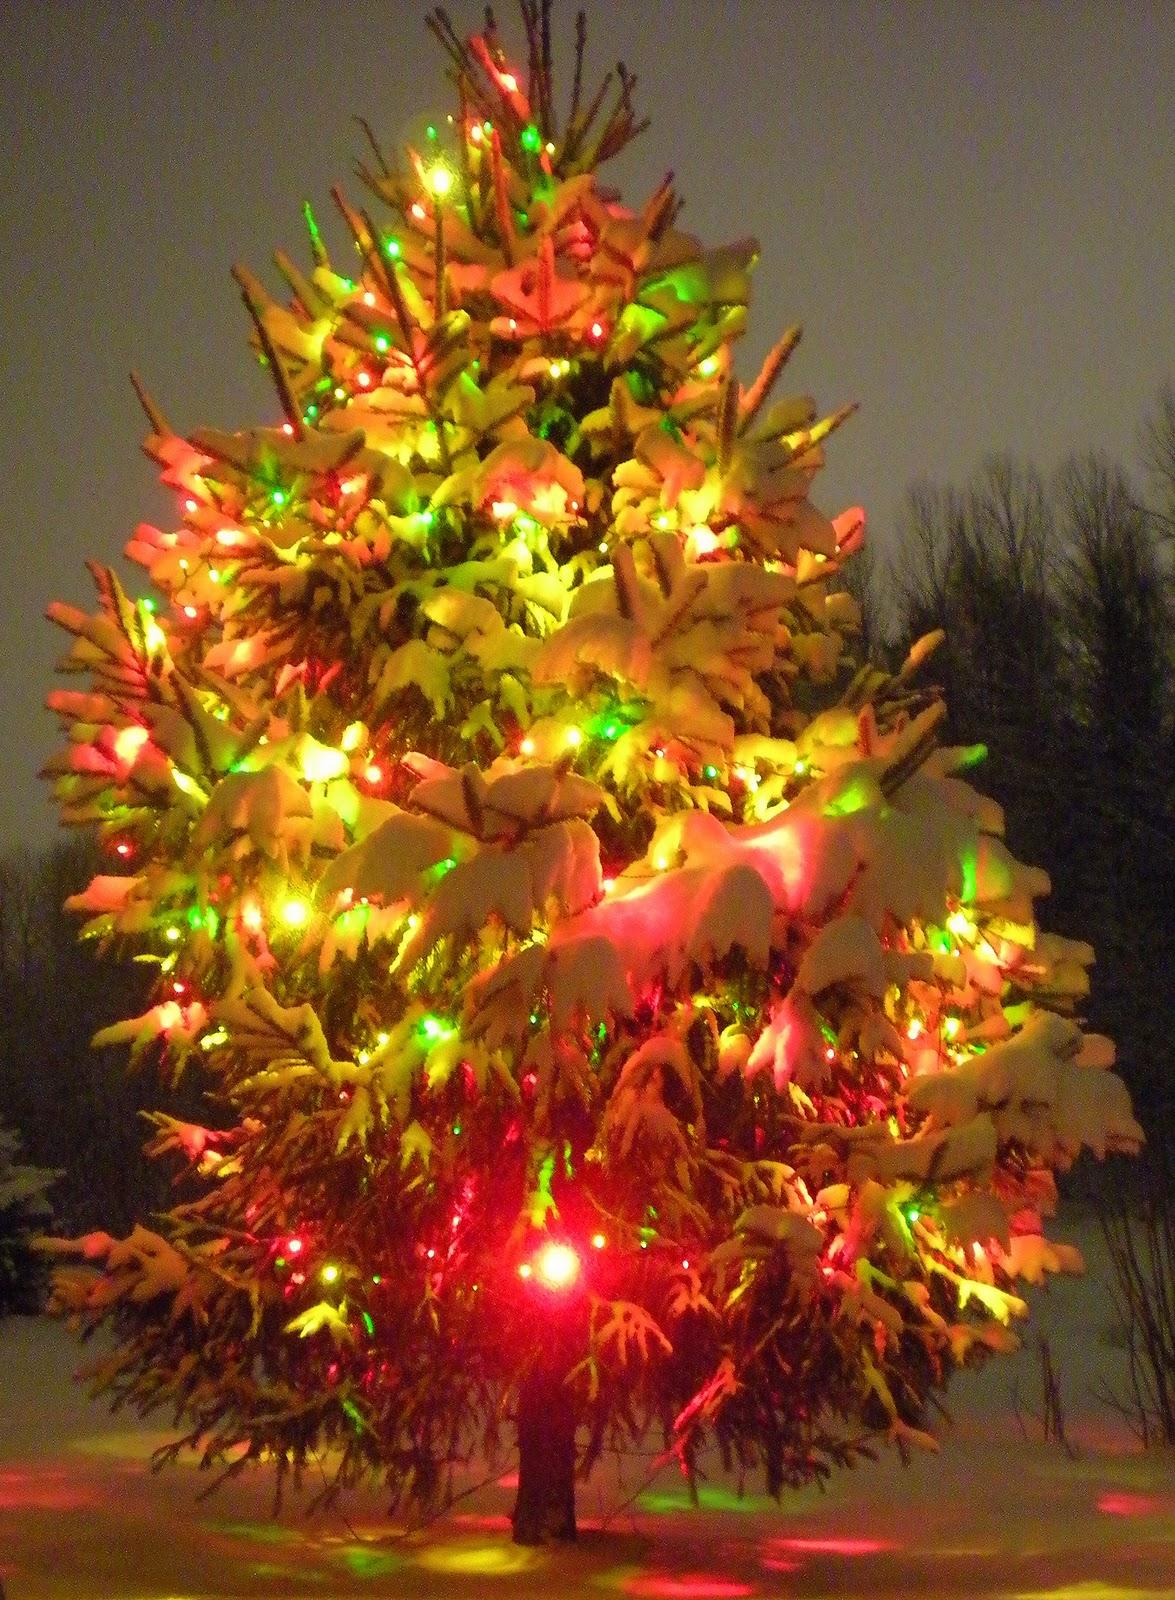 outdoor christmas tree lights are beautiful too